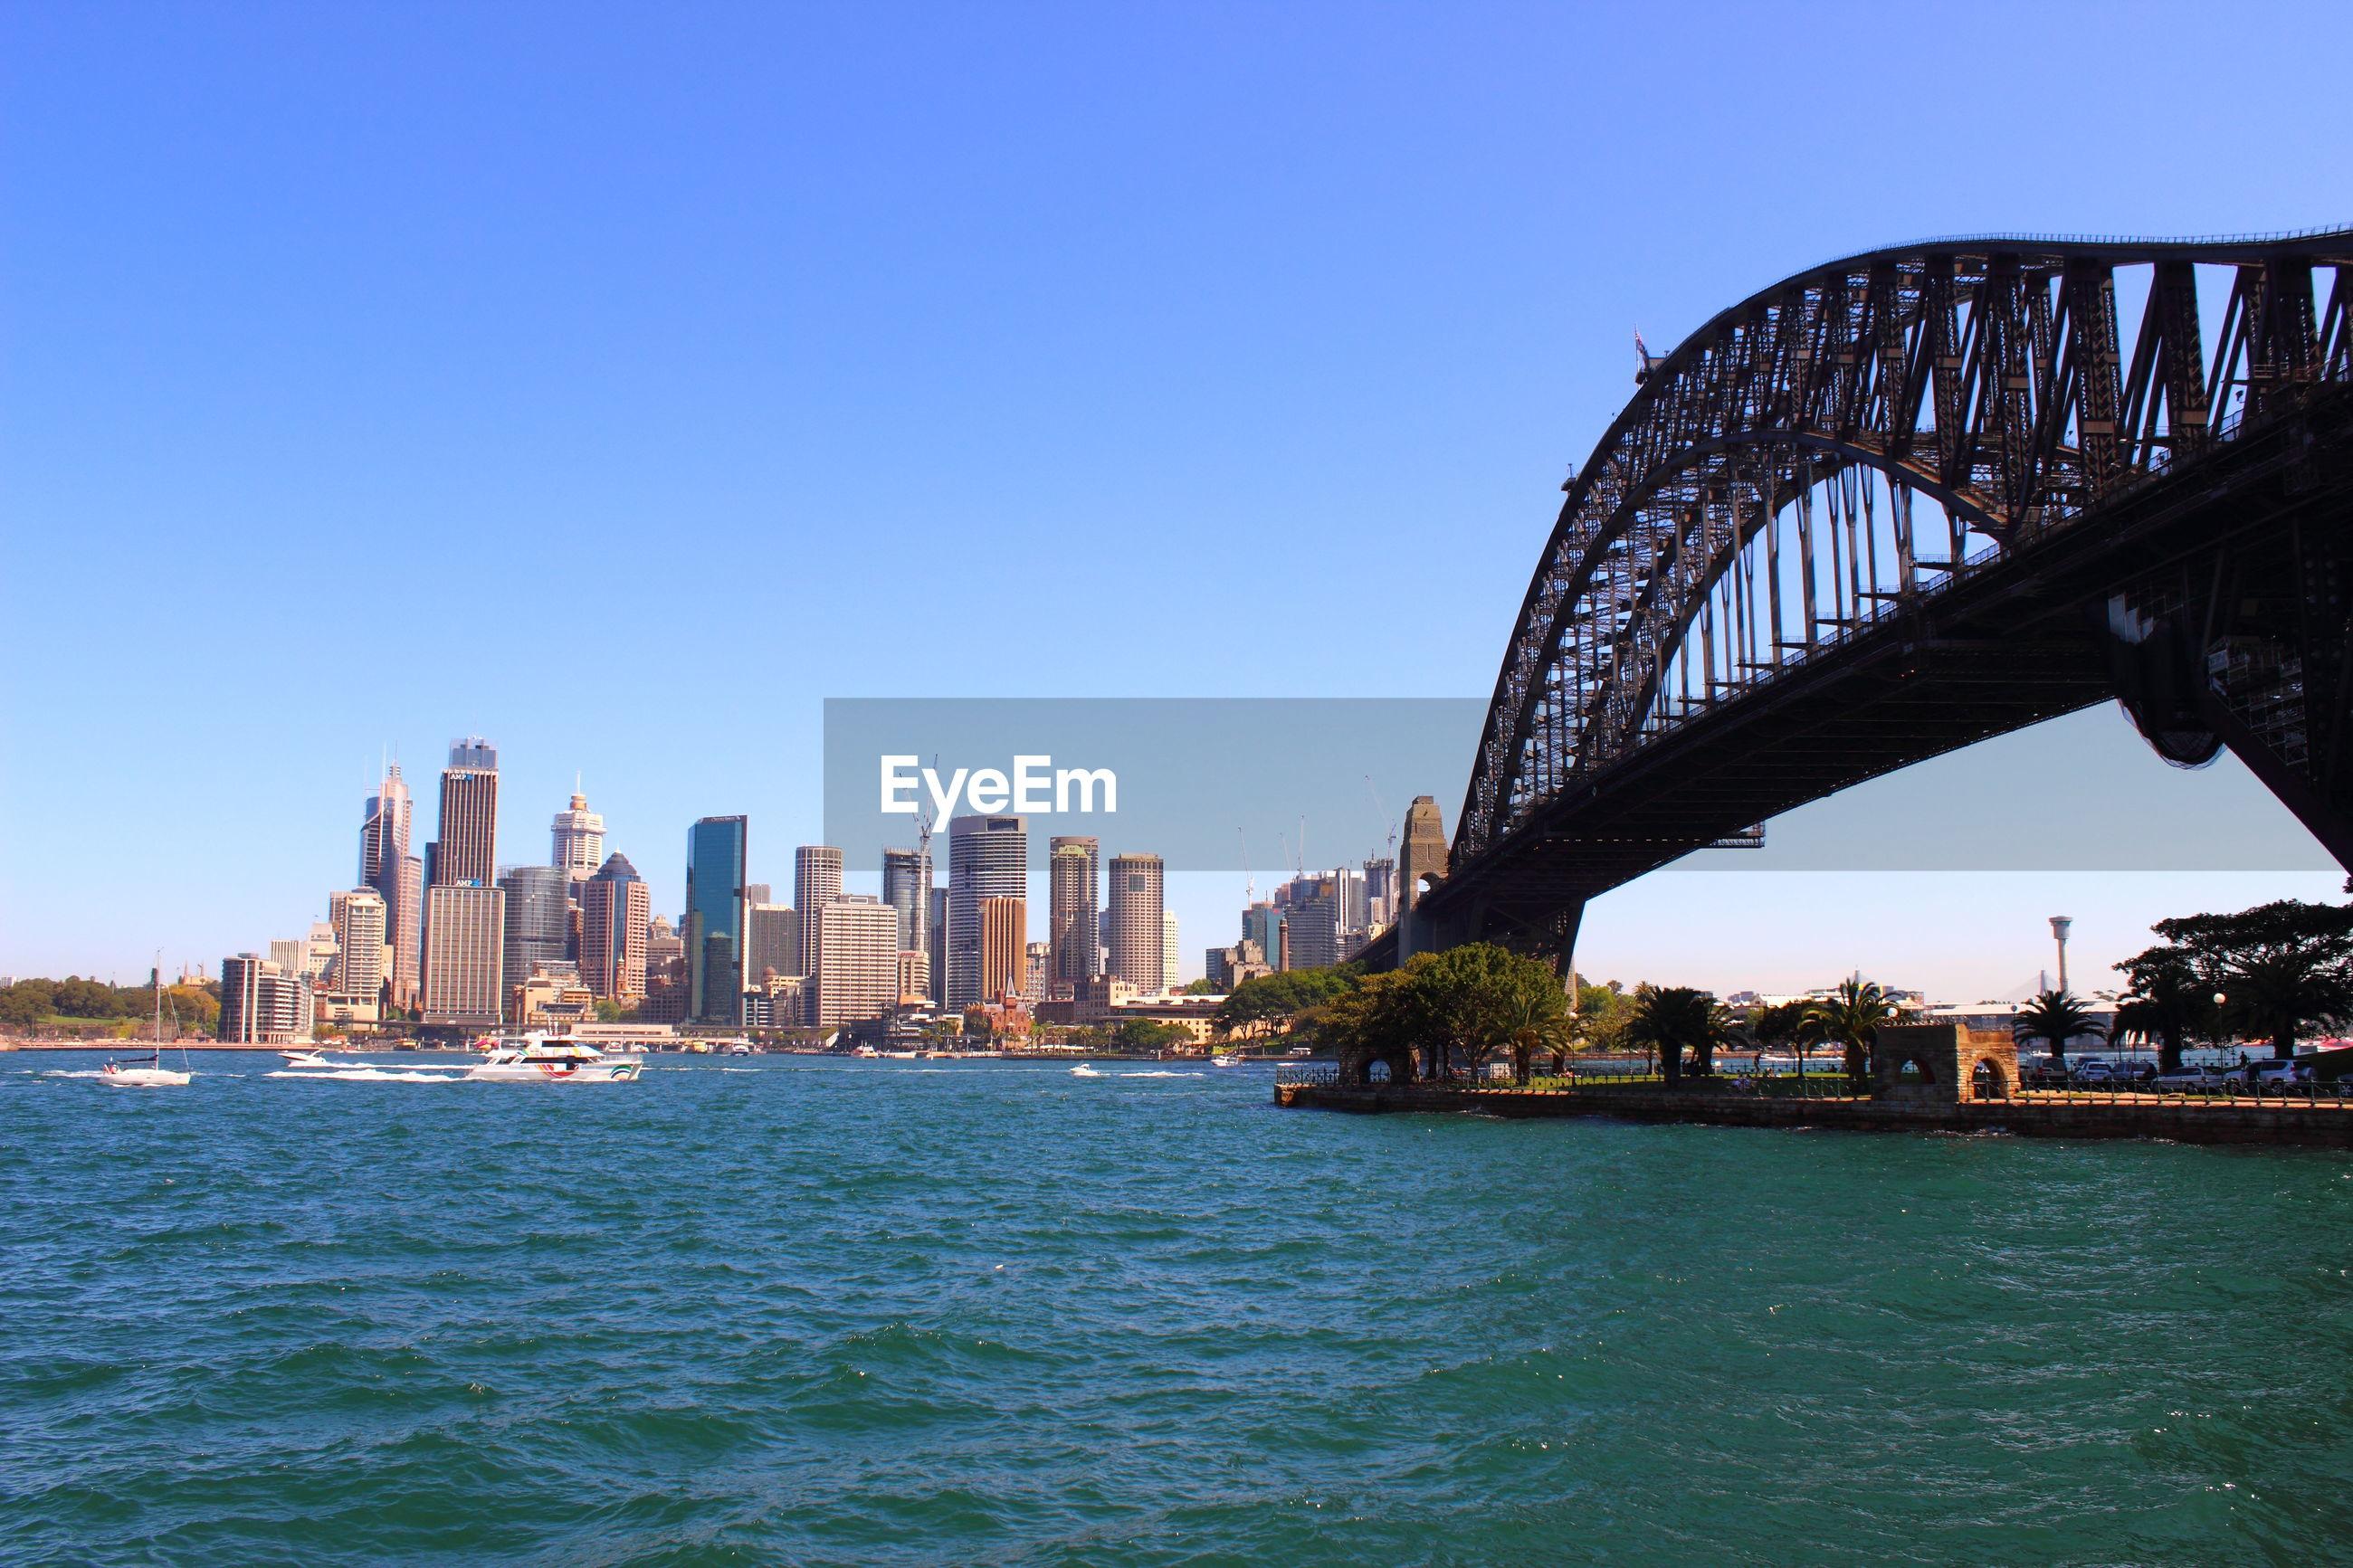 SEA BY CITY BUILDINGS AGAINST CLEAR SKY